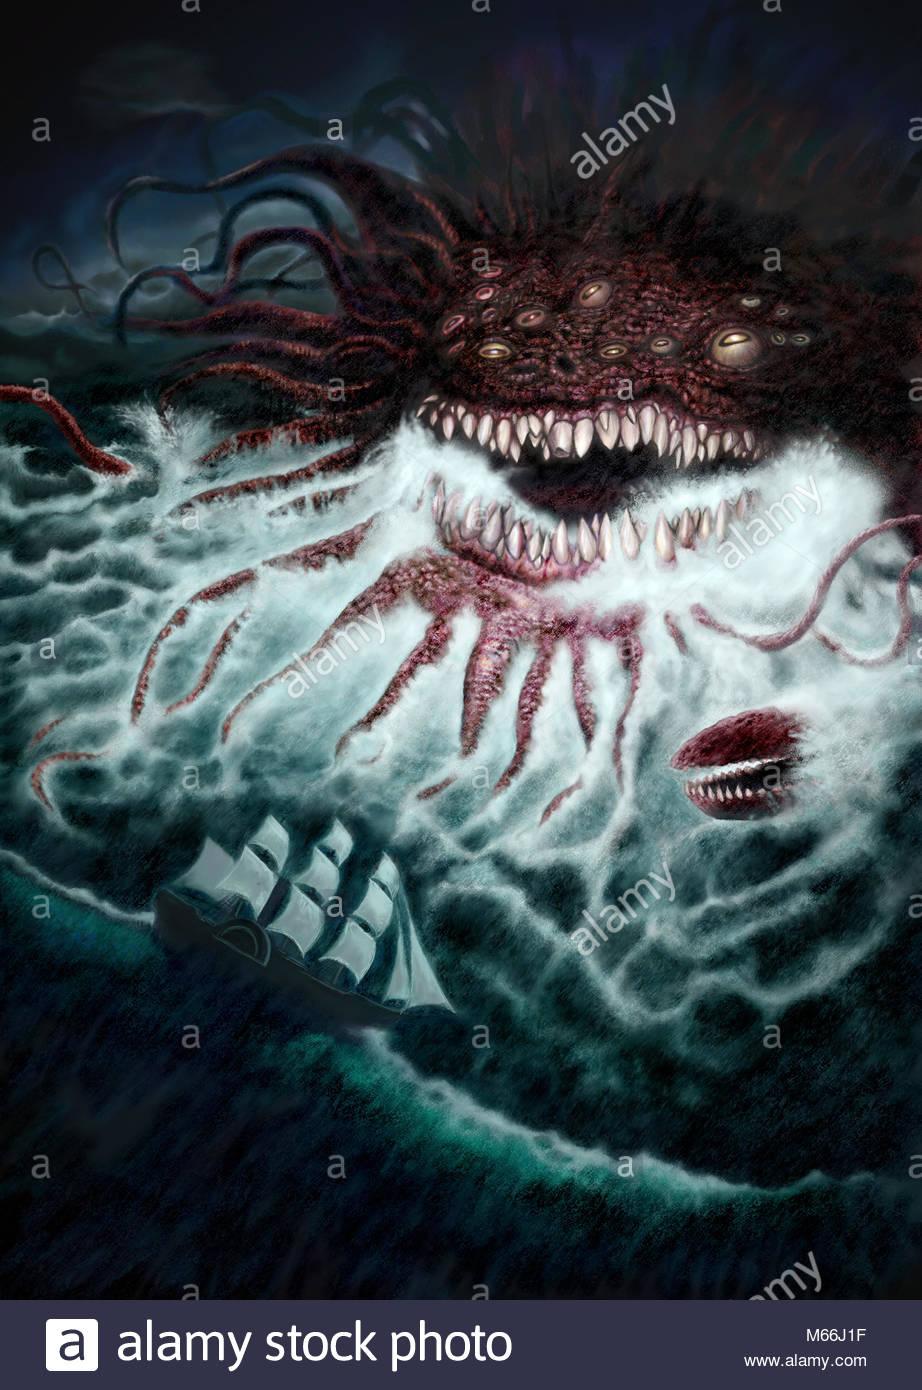 El Profanador Leviathan  Black MetalAmbient 20022015